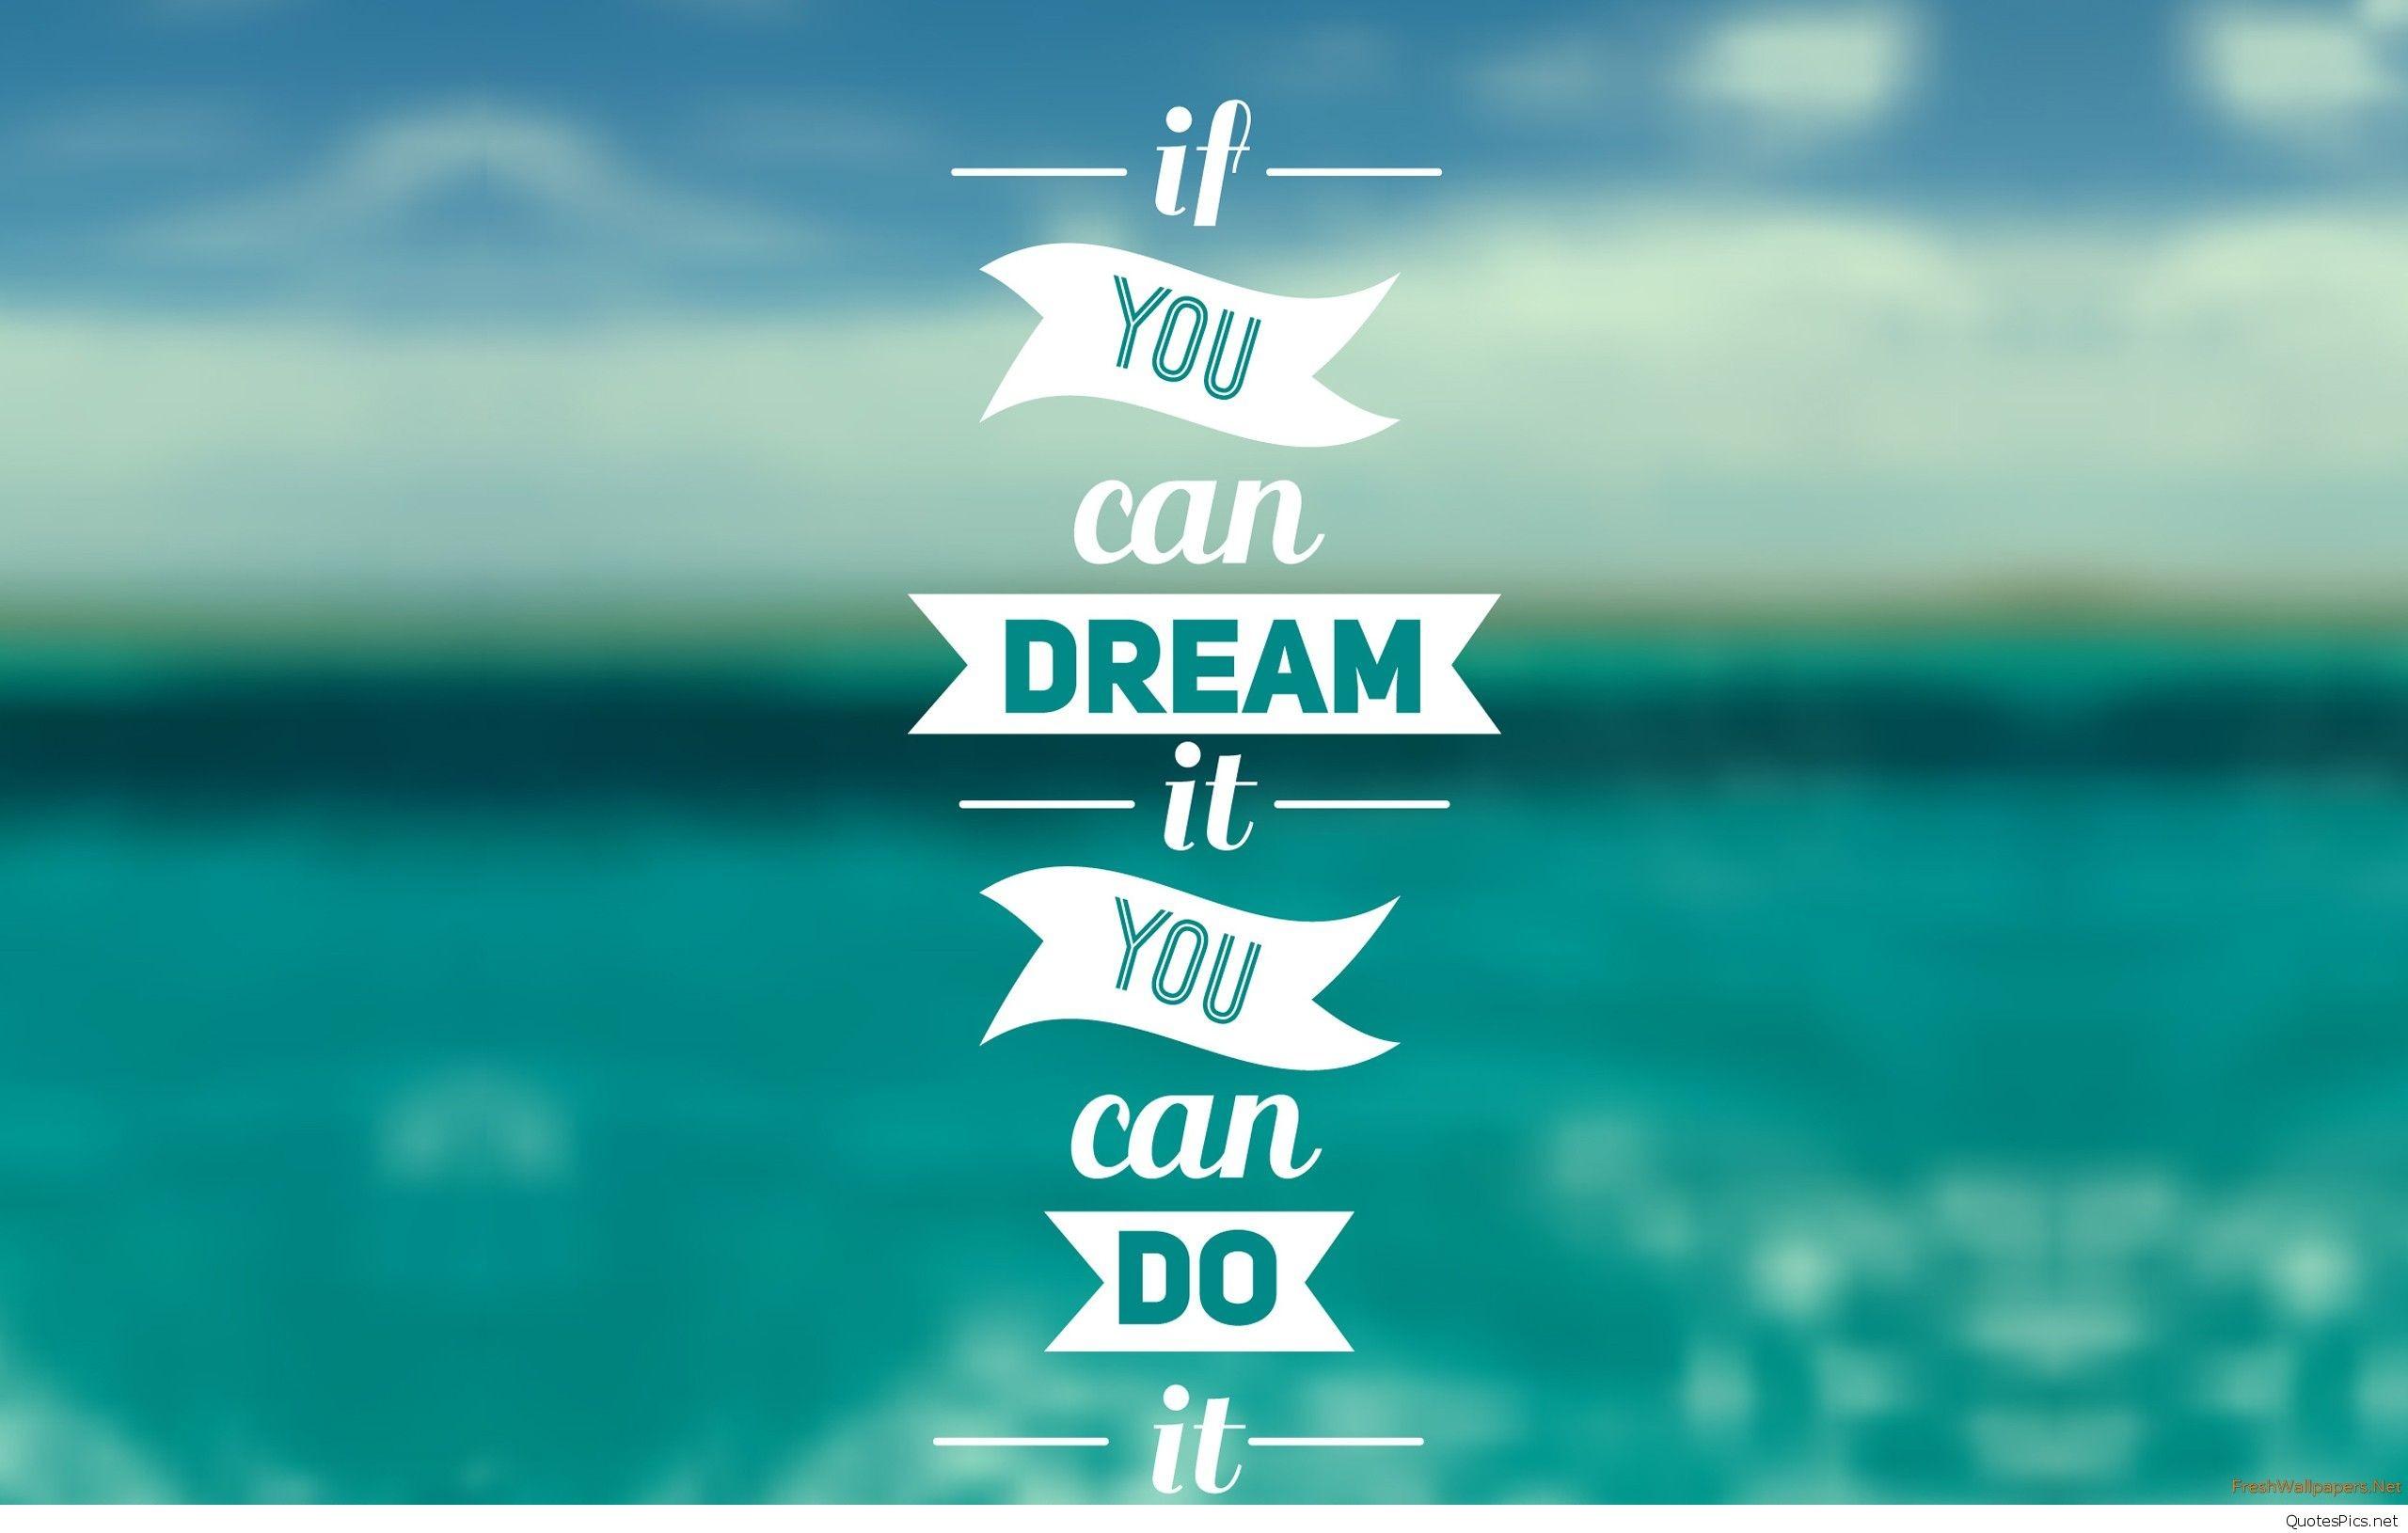 can dream it quote wallpaper hd